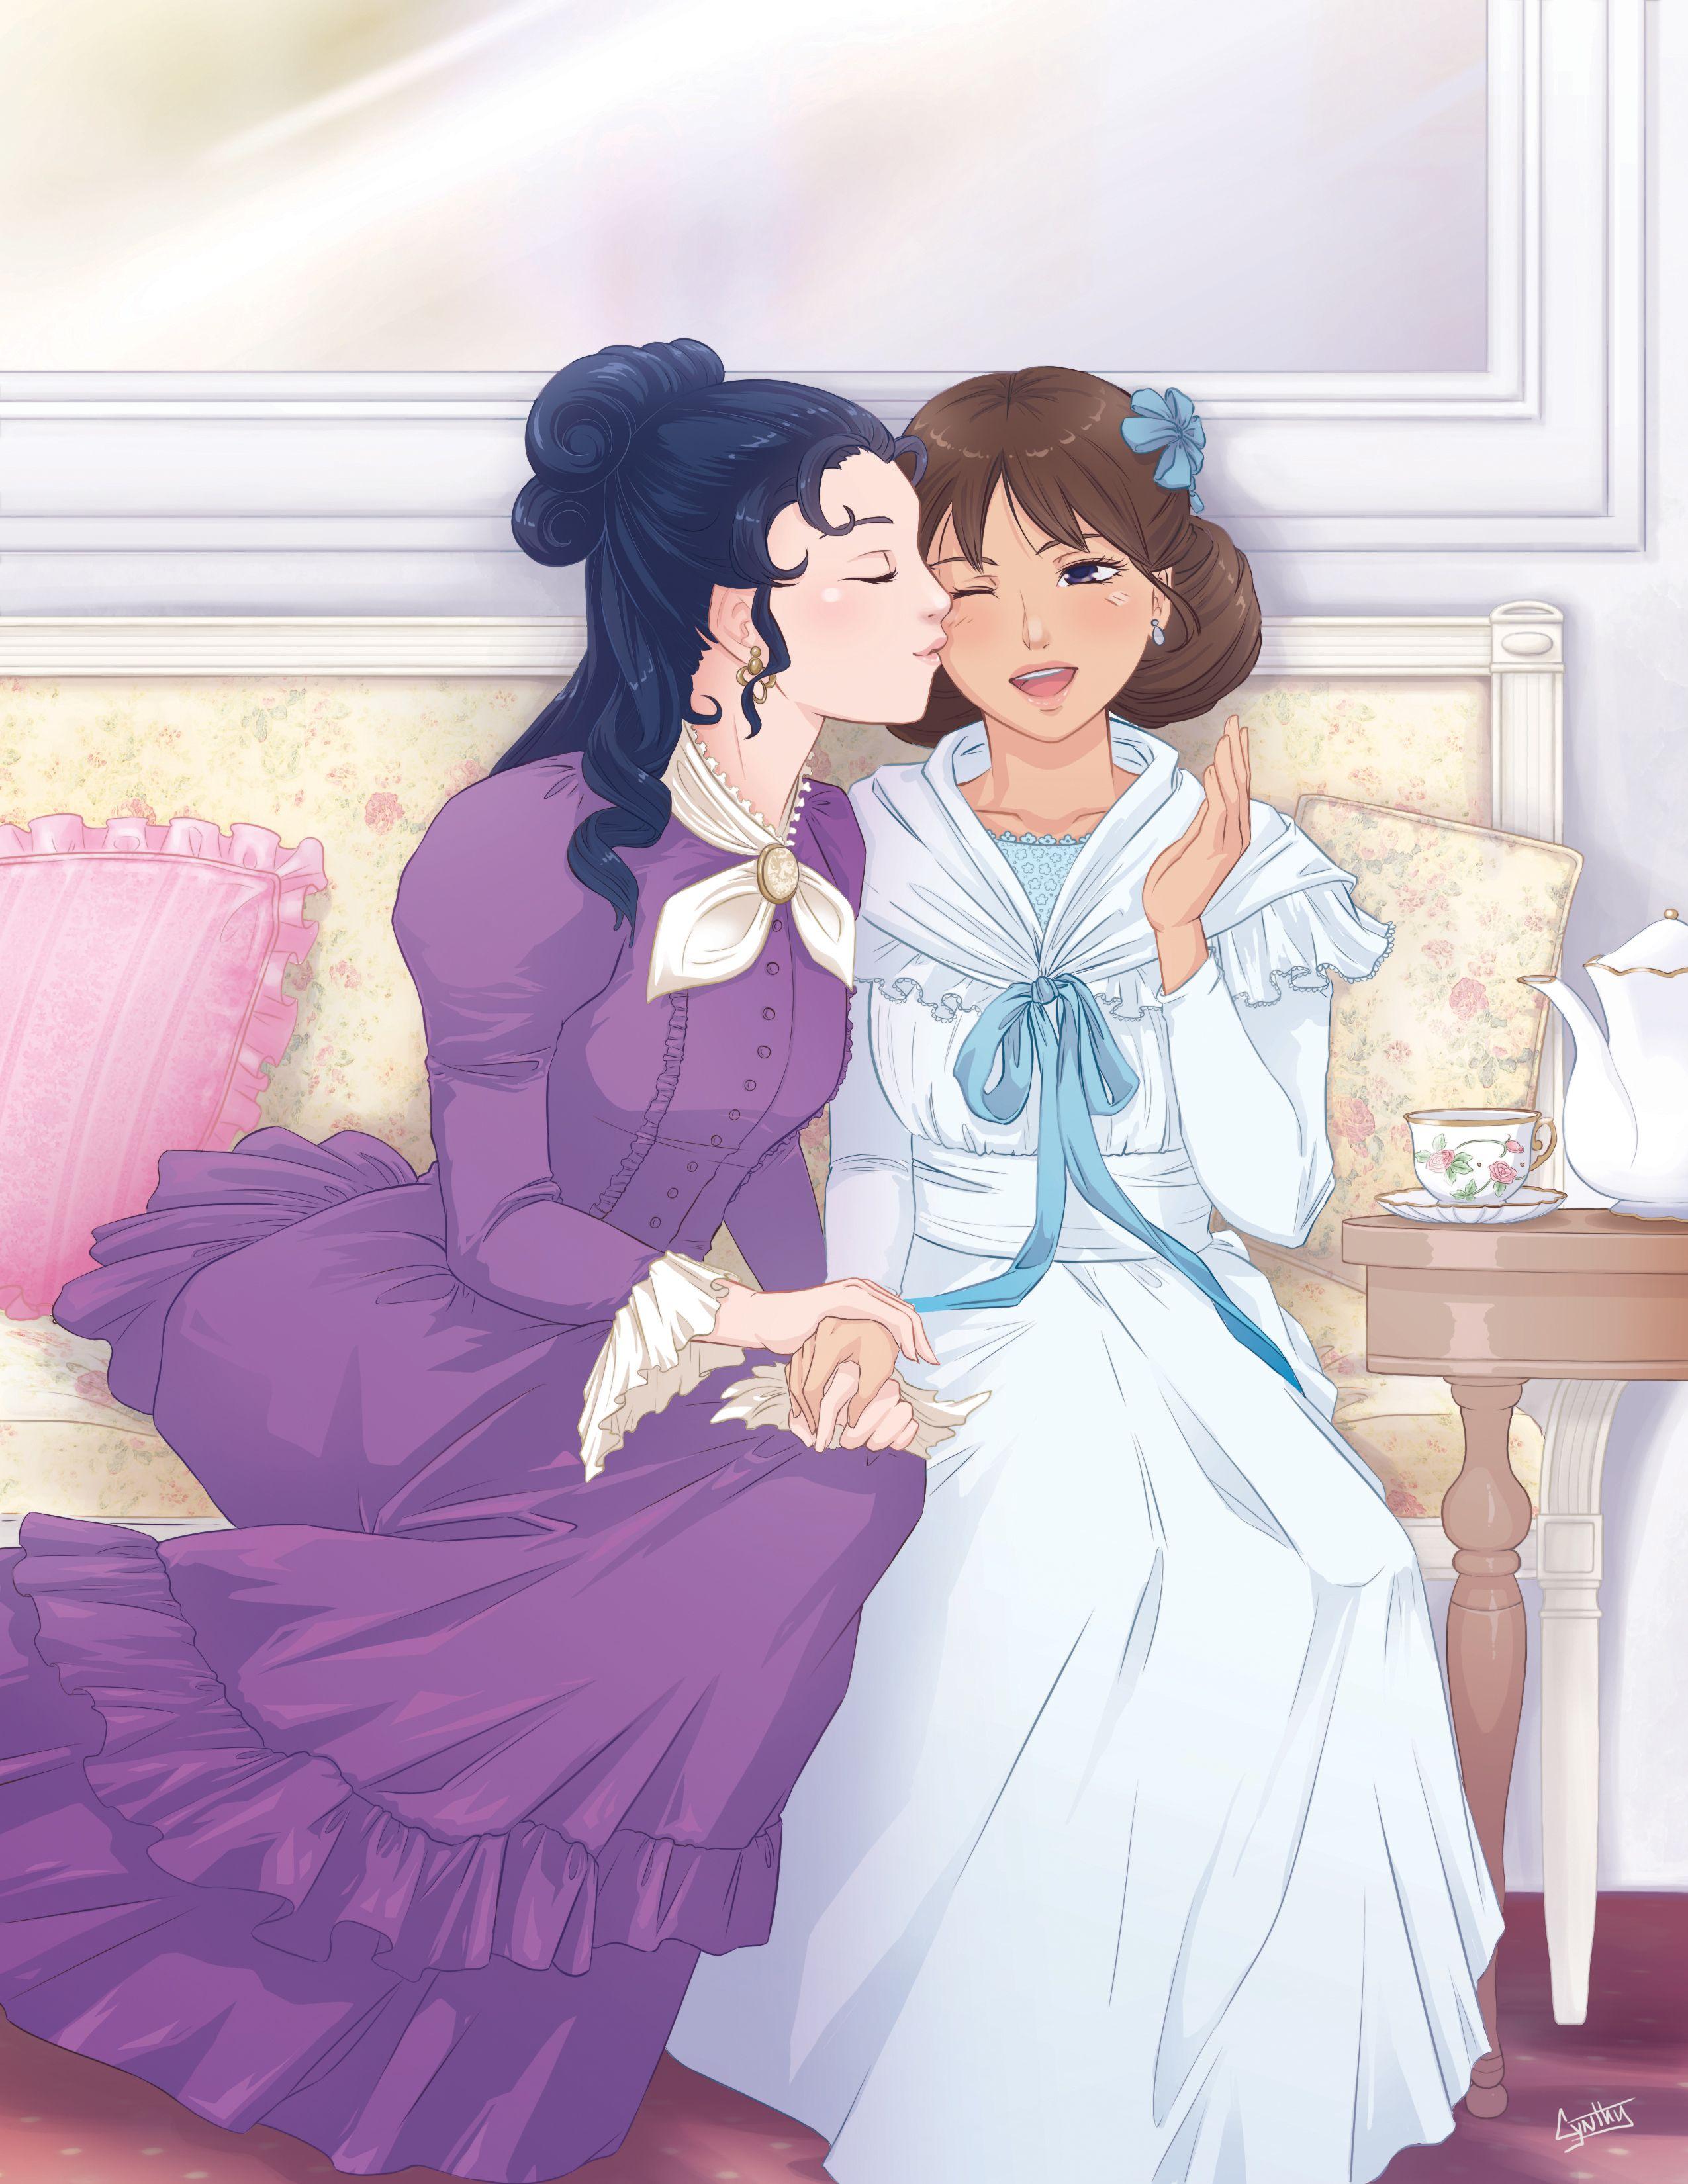 Fanart de l 39 anime princesse sarah repr sentant sarah crewe et becky 10 ans apr s le dernier - Dessin anime de princesse sarah ...